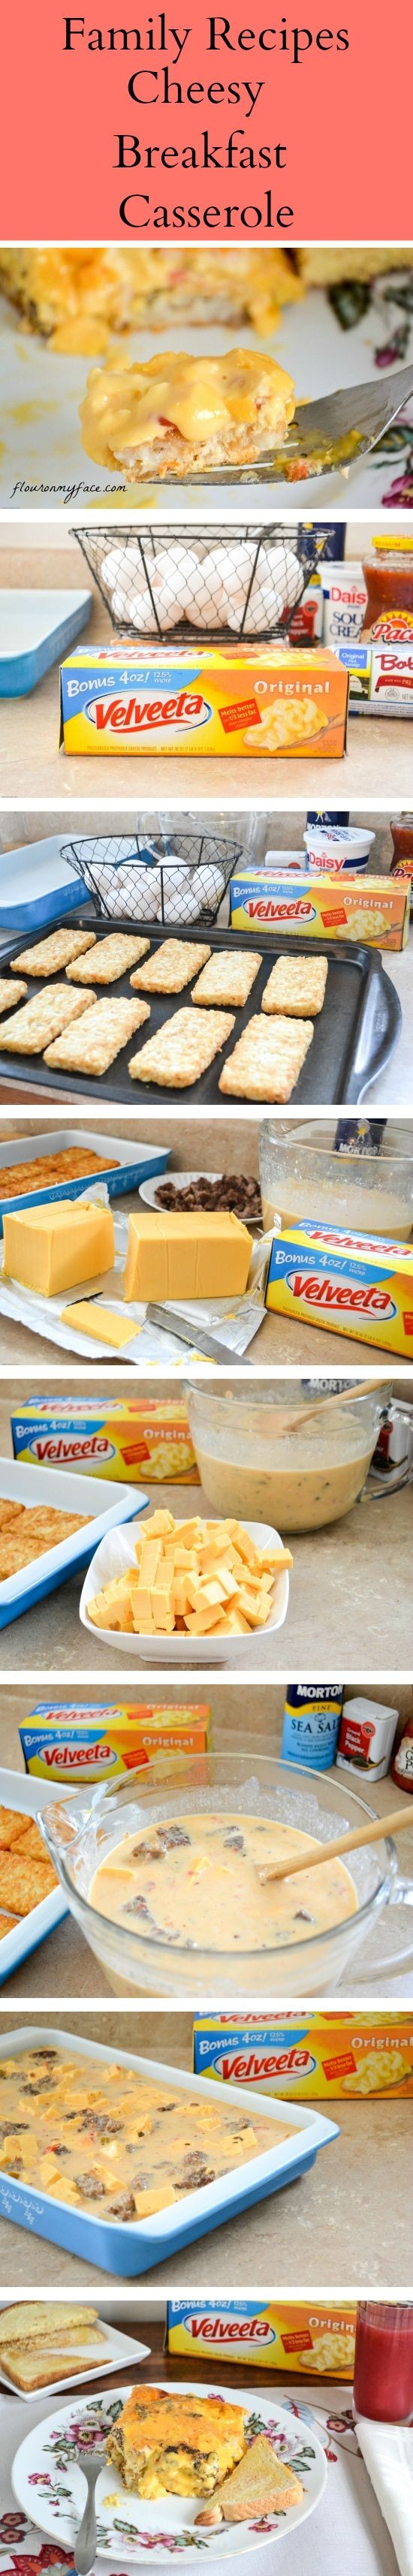 Ooey Gooey run down your chin Cheesy Breakfast Casserole http://flouronmyface.com